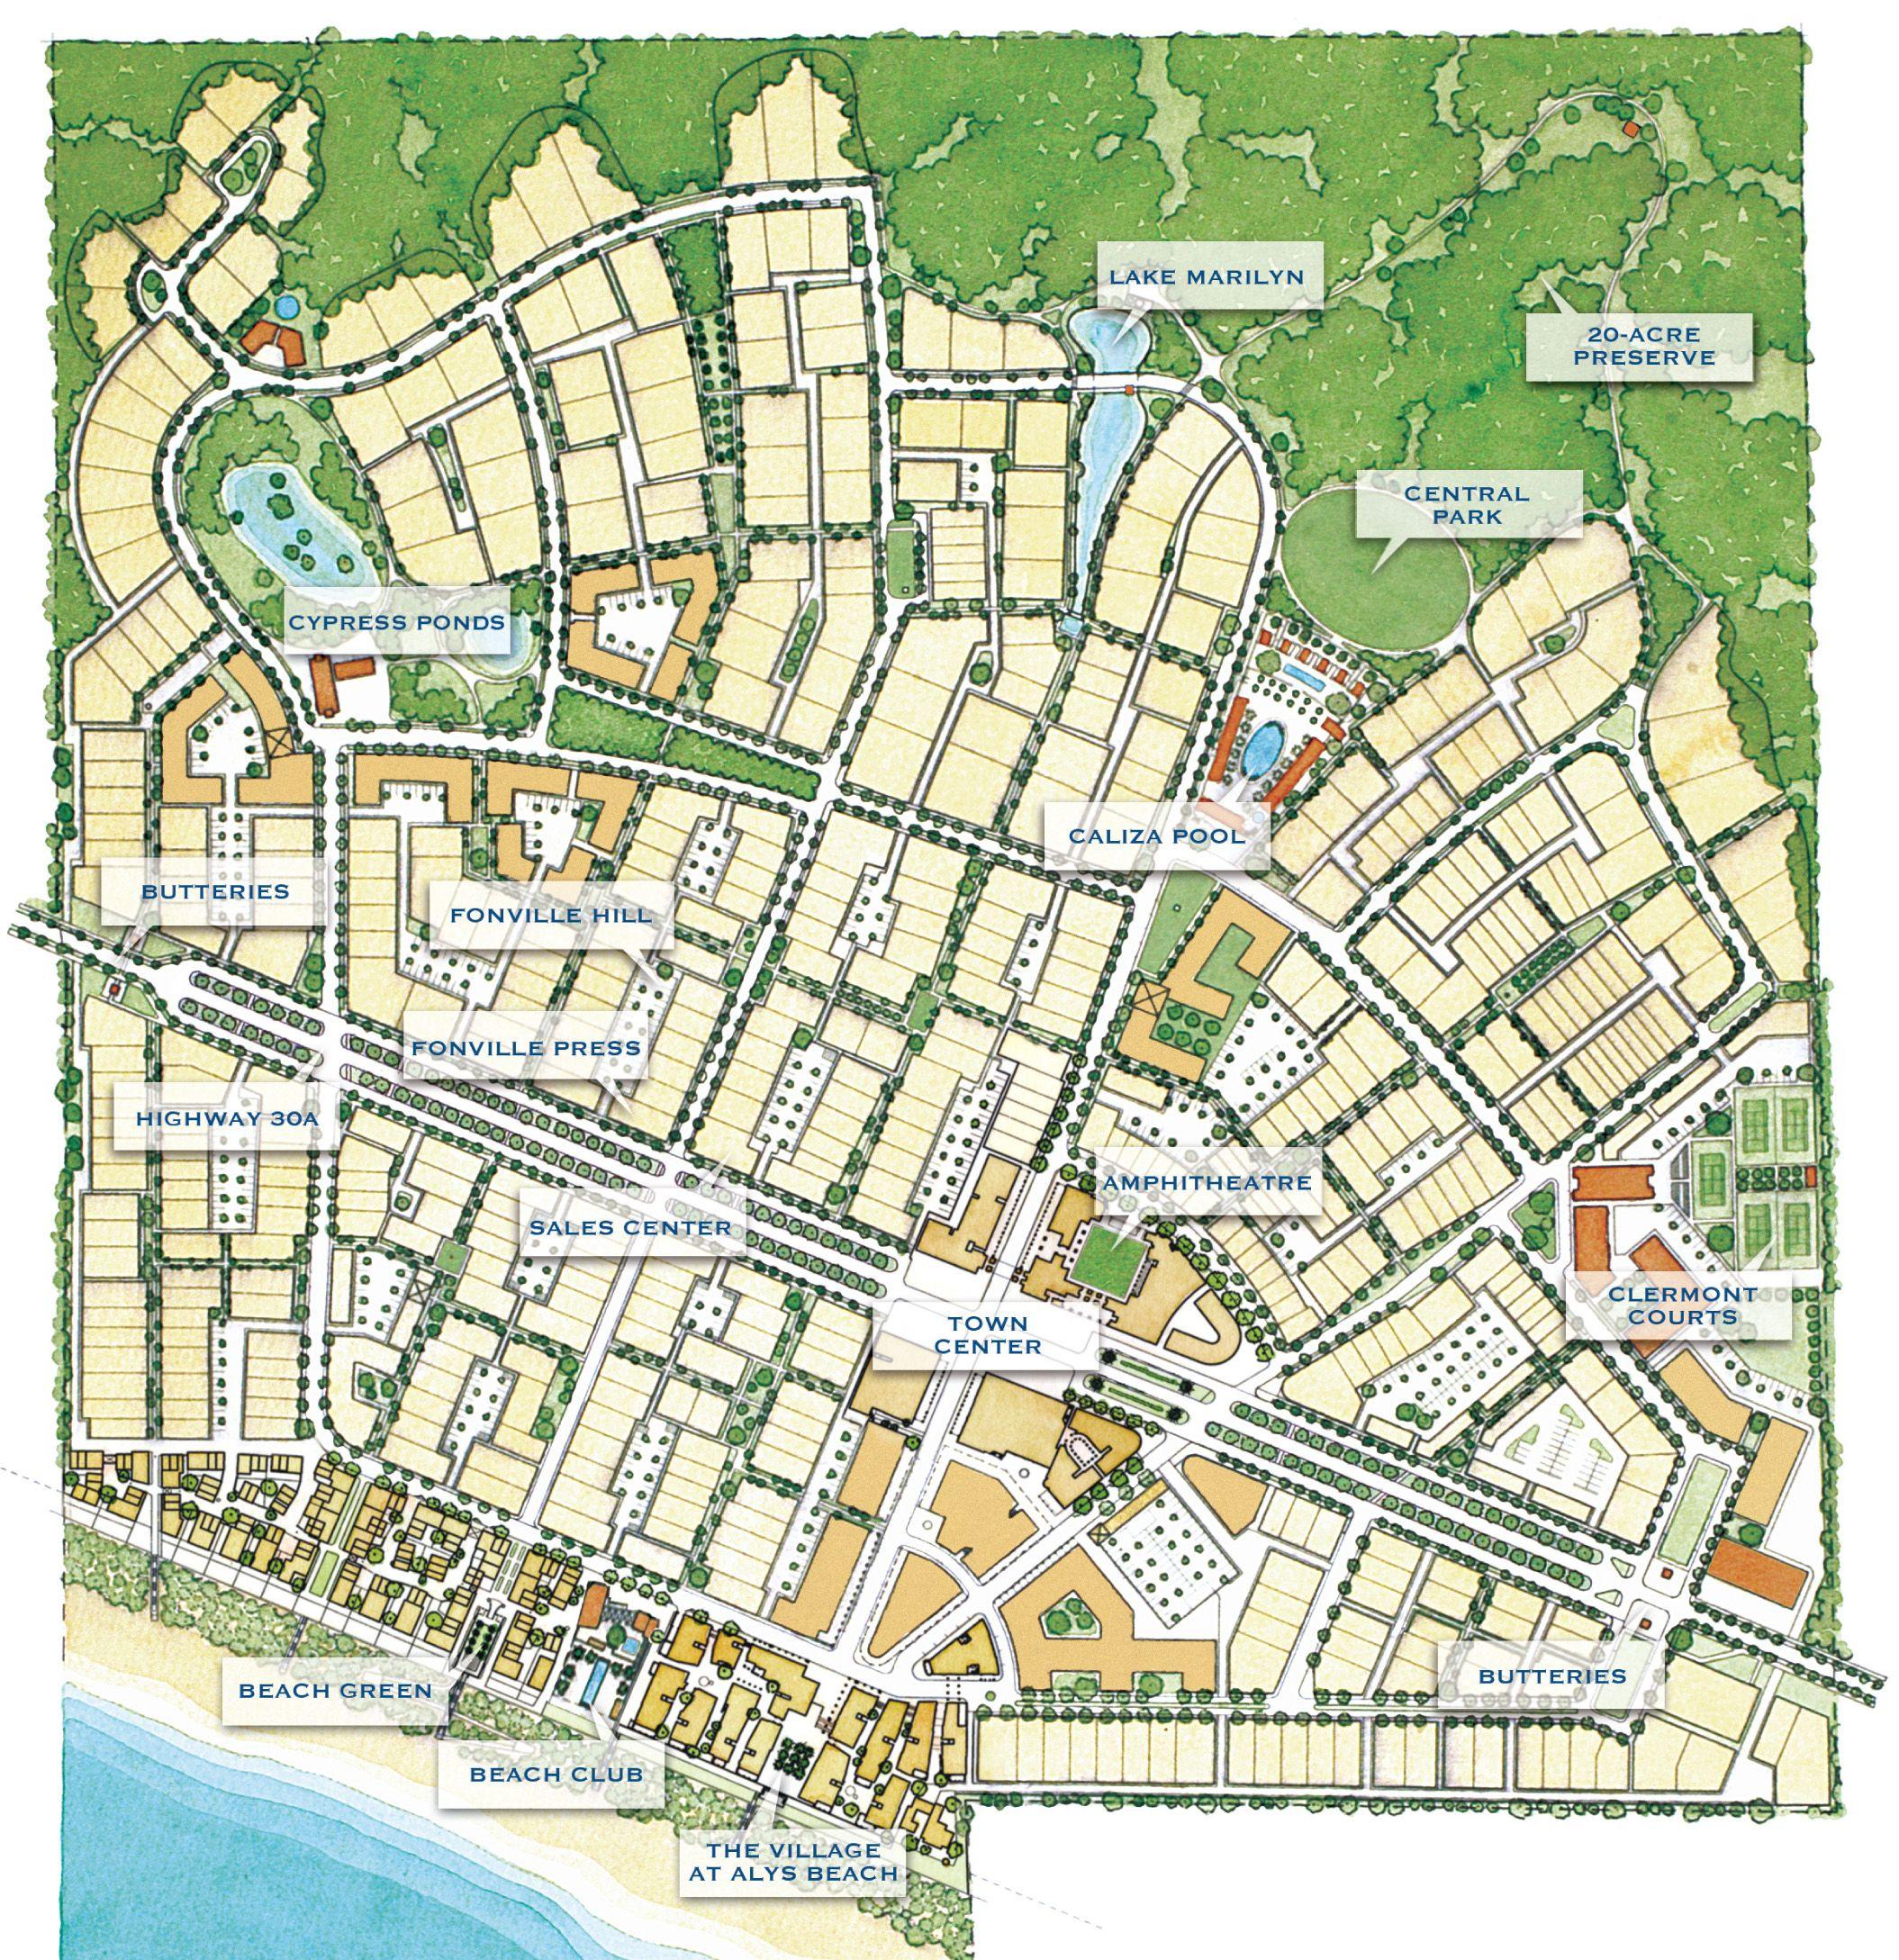 Alys Beach Florida Map | The Best Beaches In The World - Rosemary Beach Florida Map